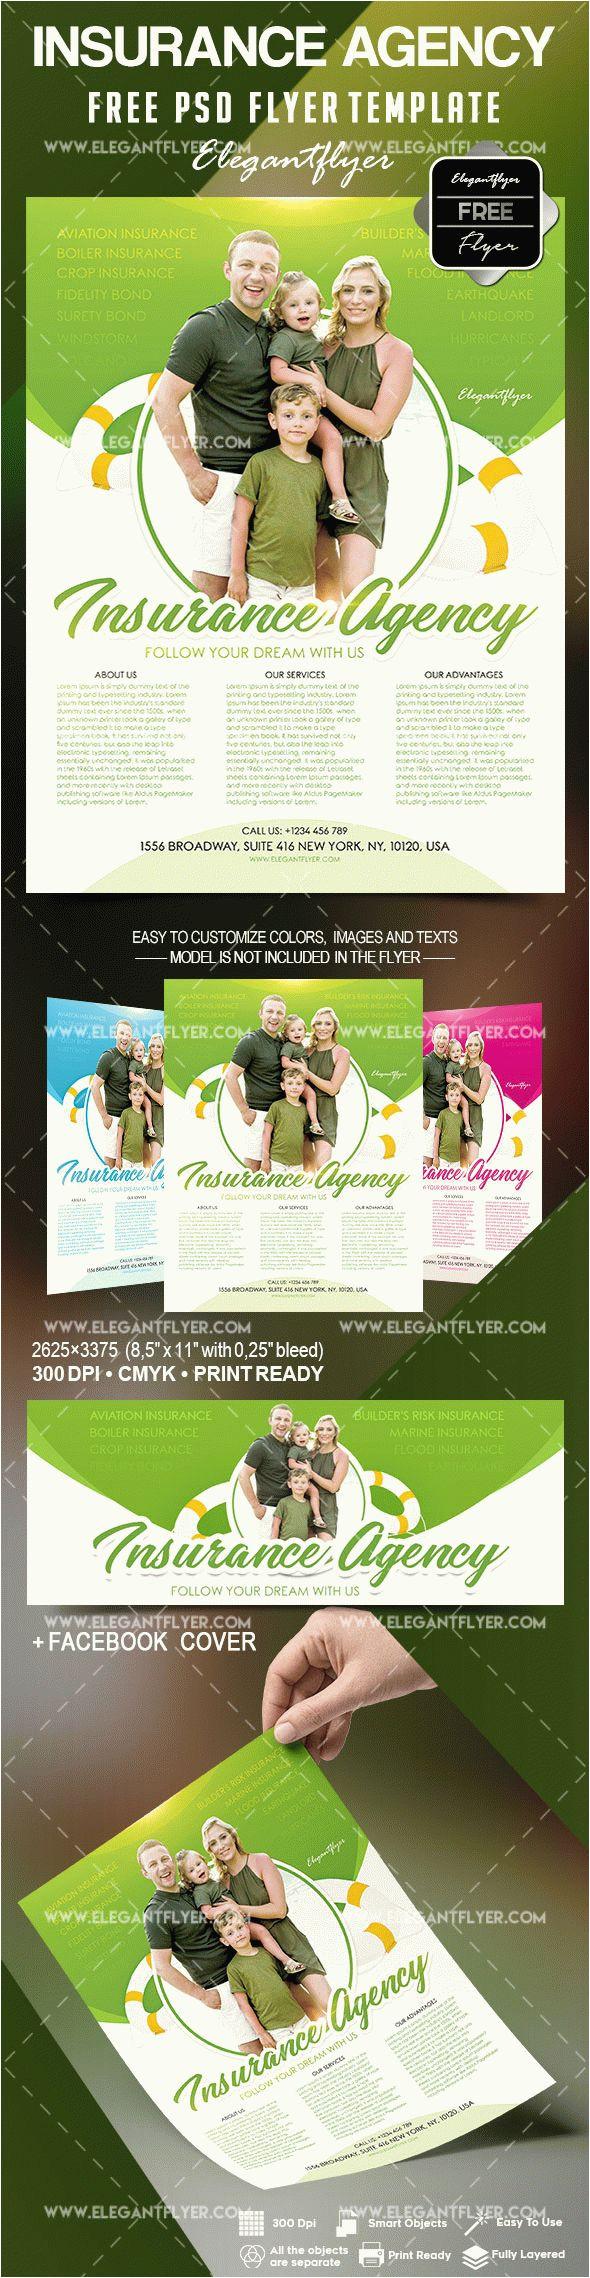 free insurance agency flyer template